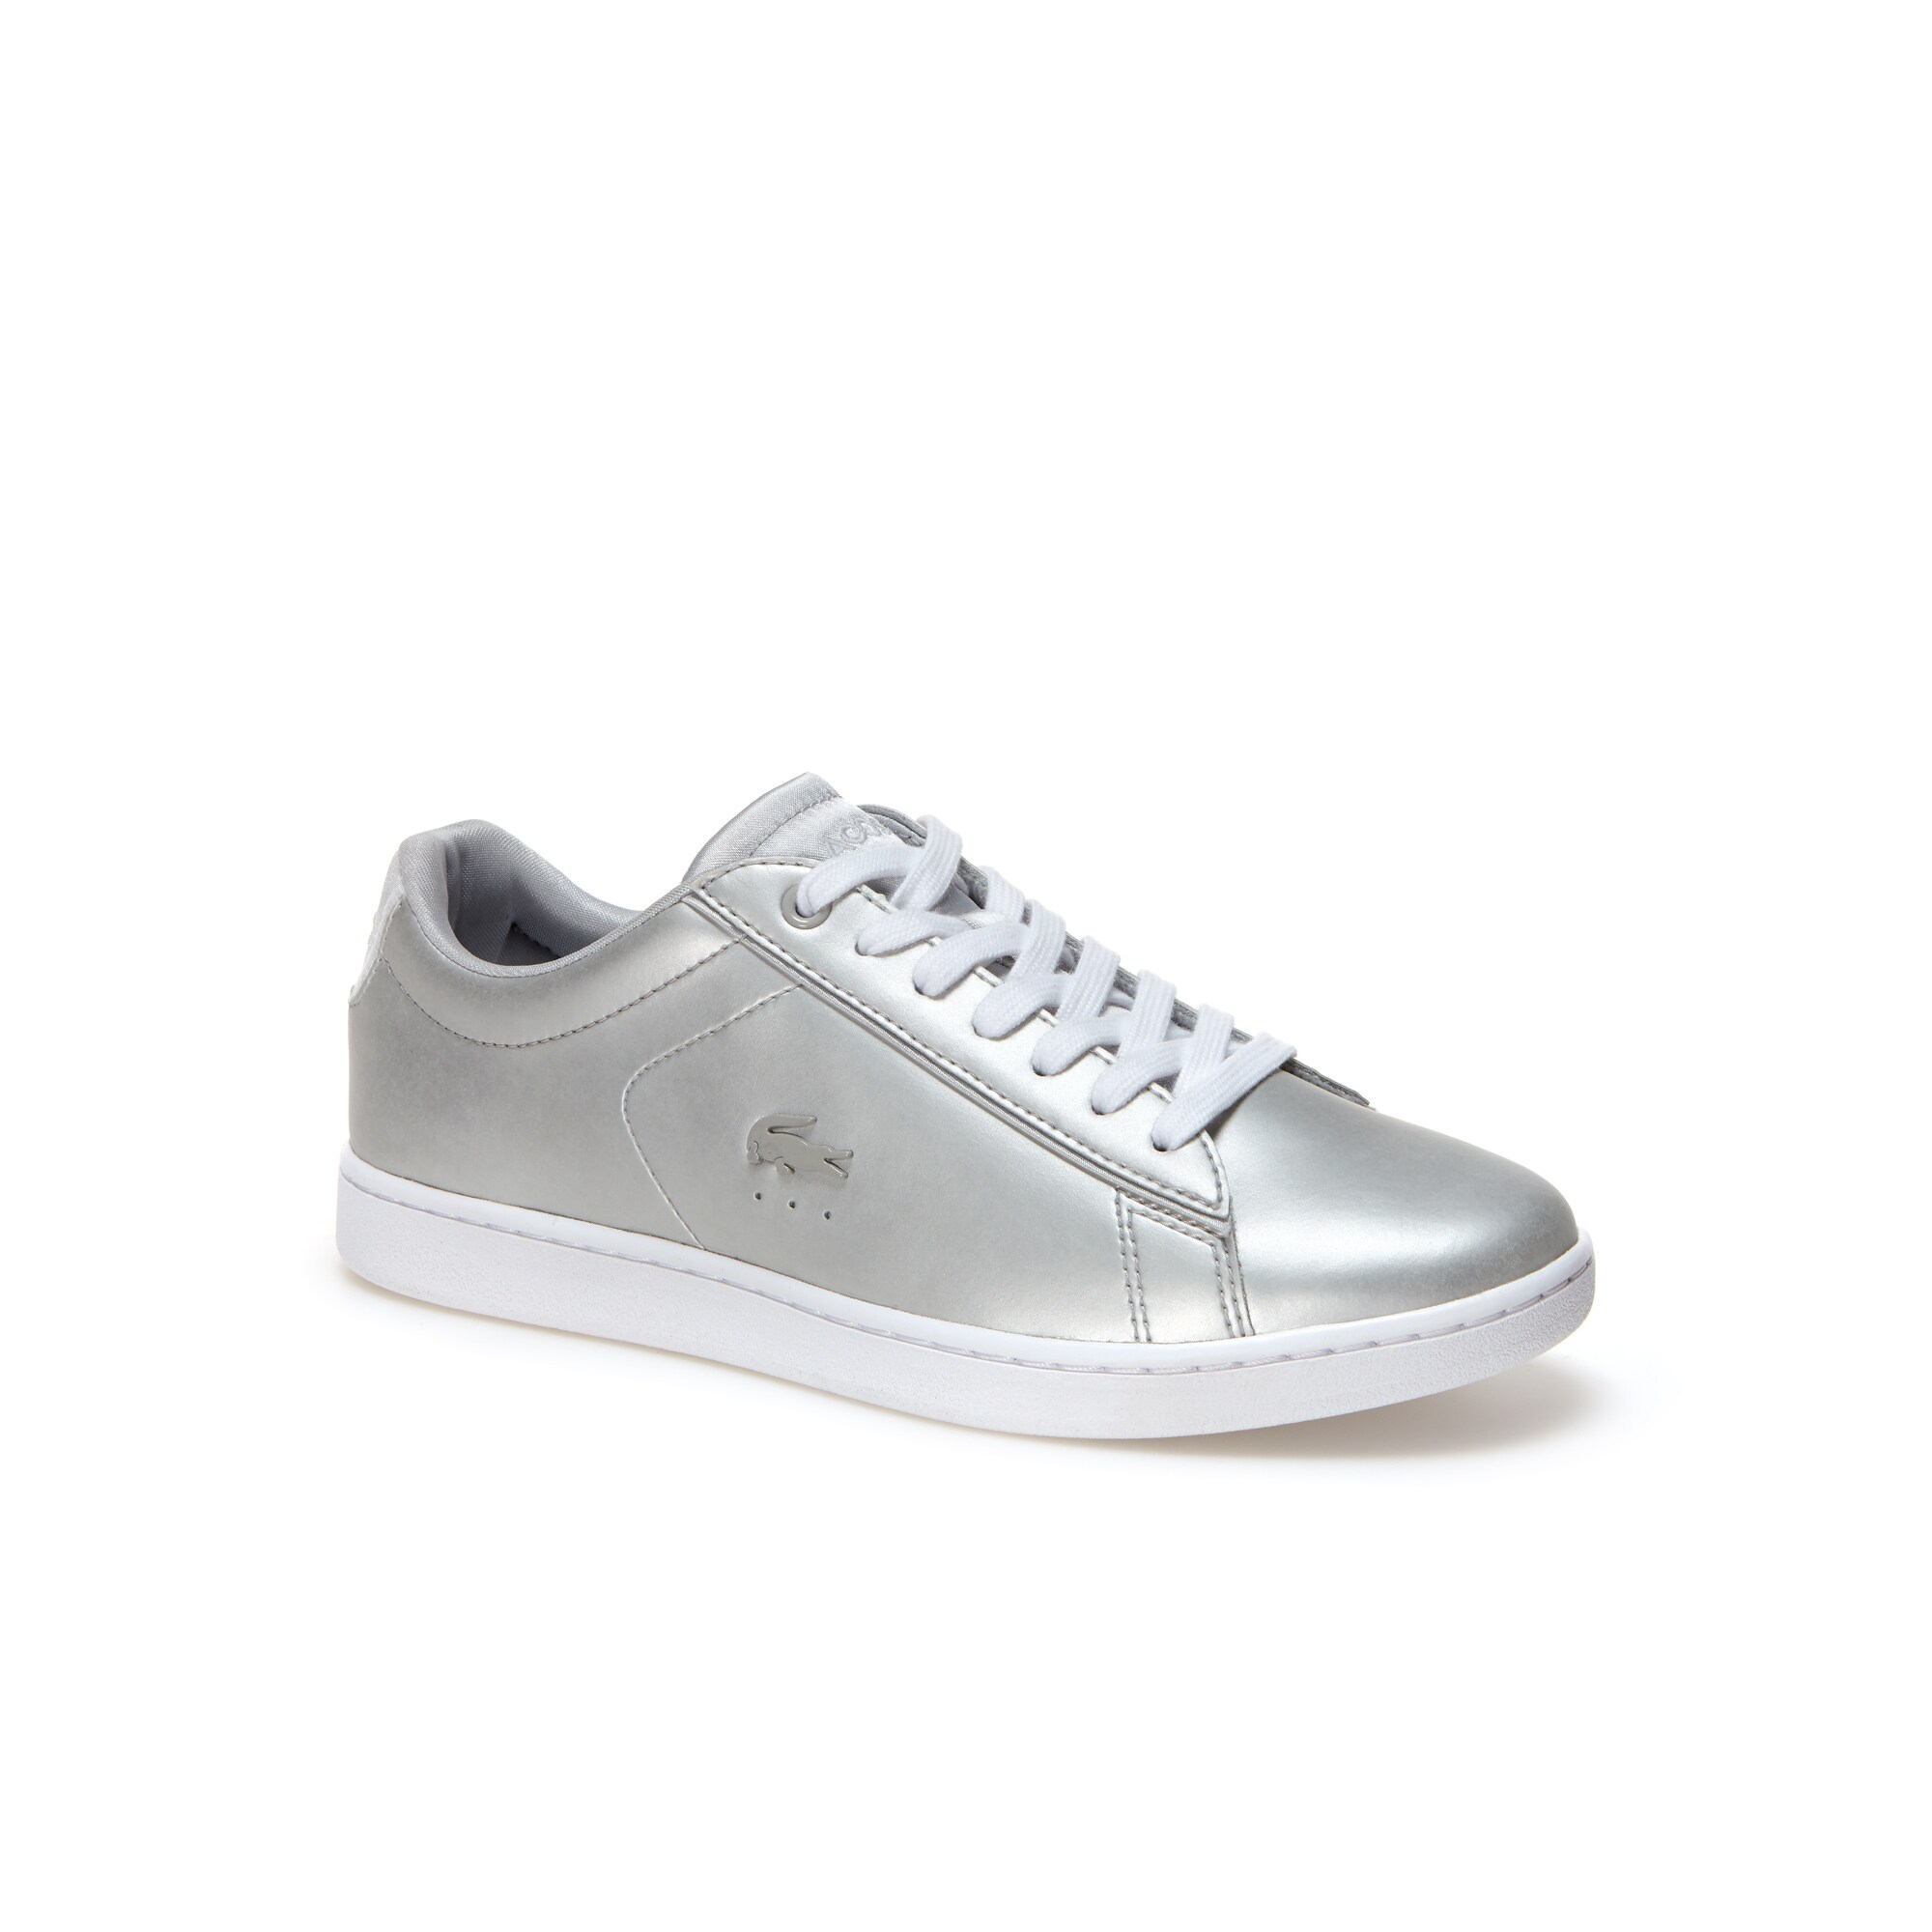 Sneakers Carnaby Evo en cuir avec finition métallisée